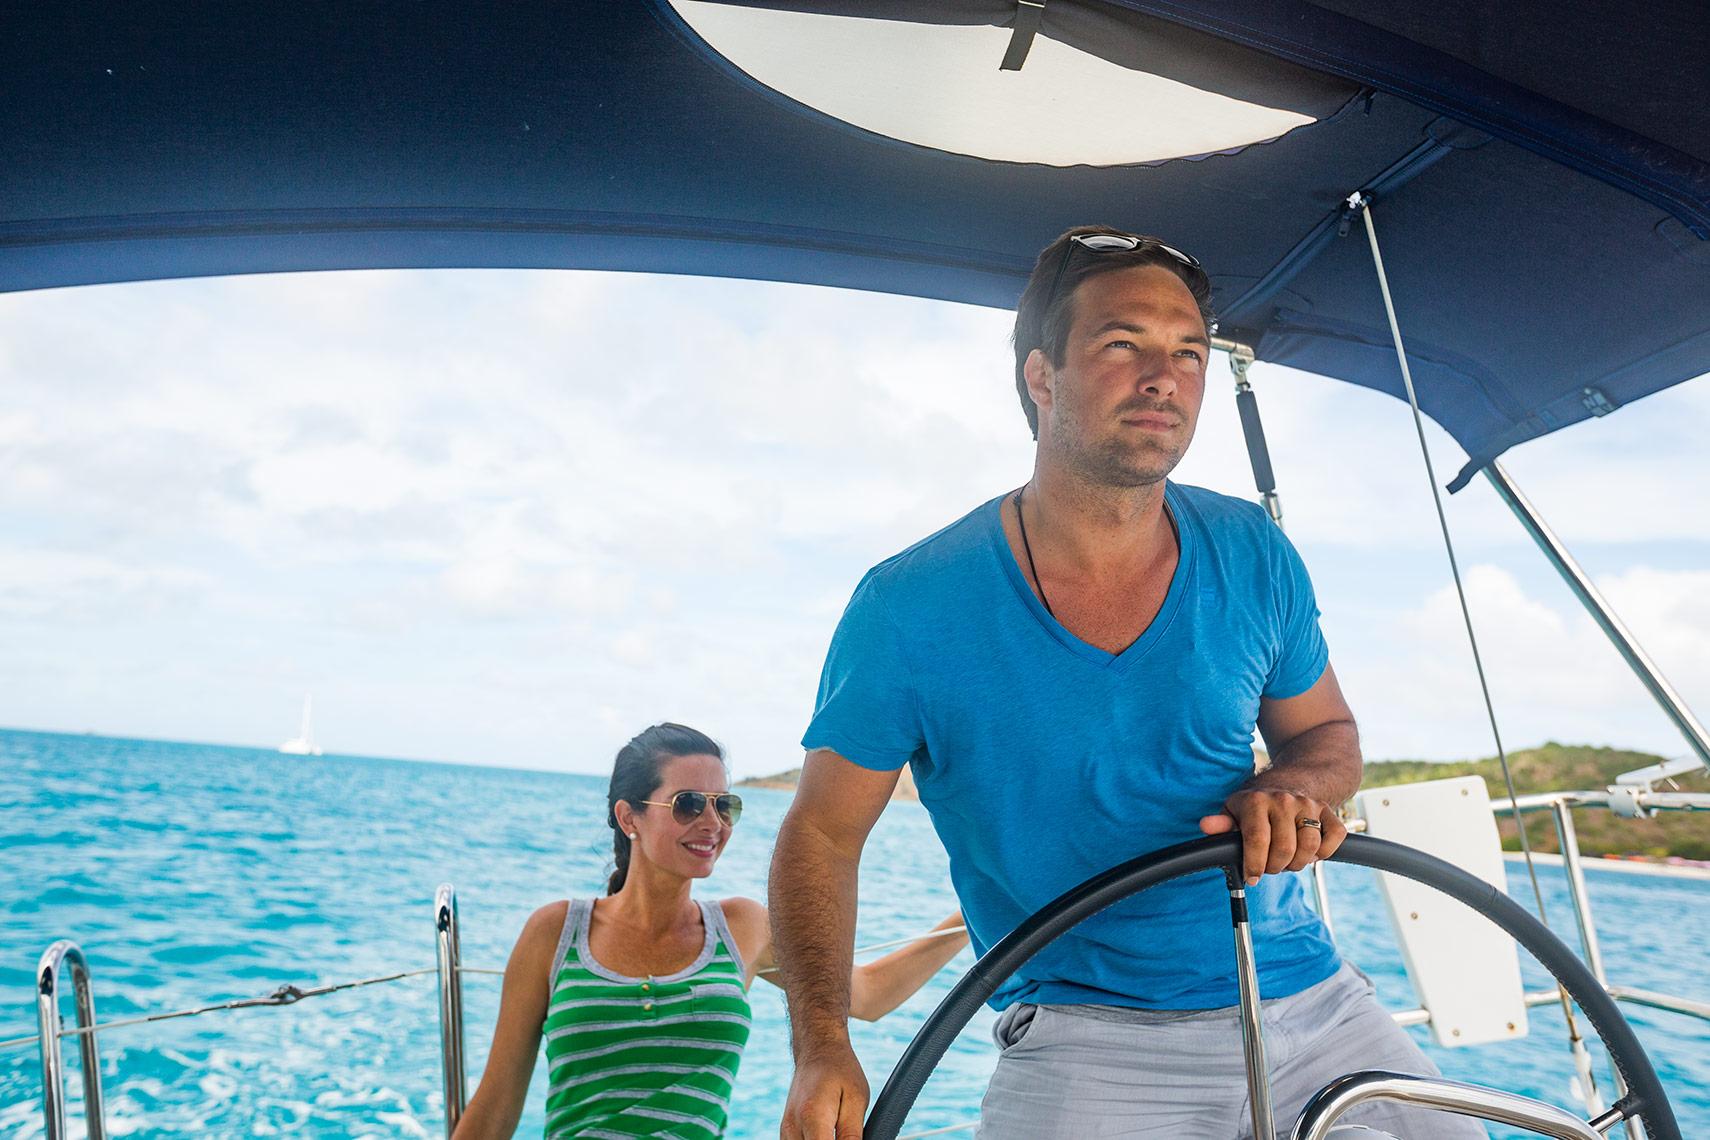 Day4_Souhka453_Sailing_OnBoat_NorthSound_Moorings_0236_r1_FLAT.jpg